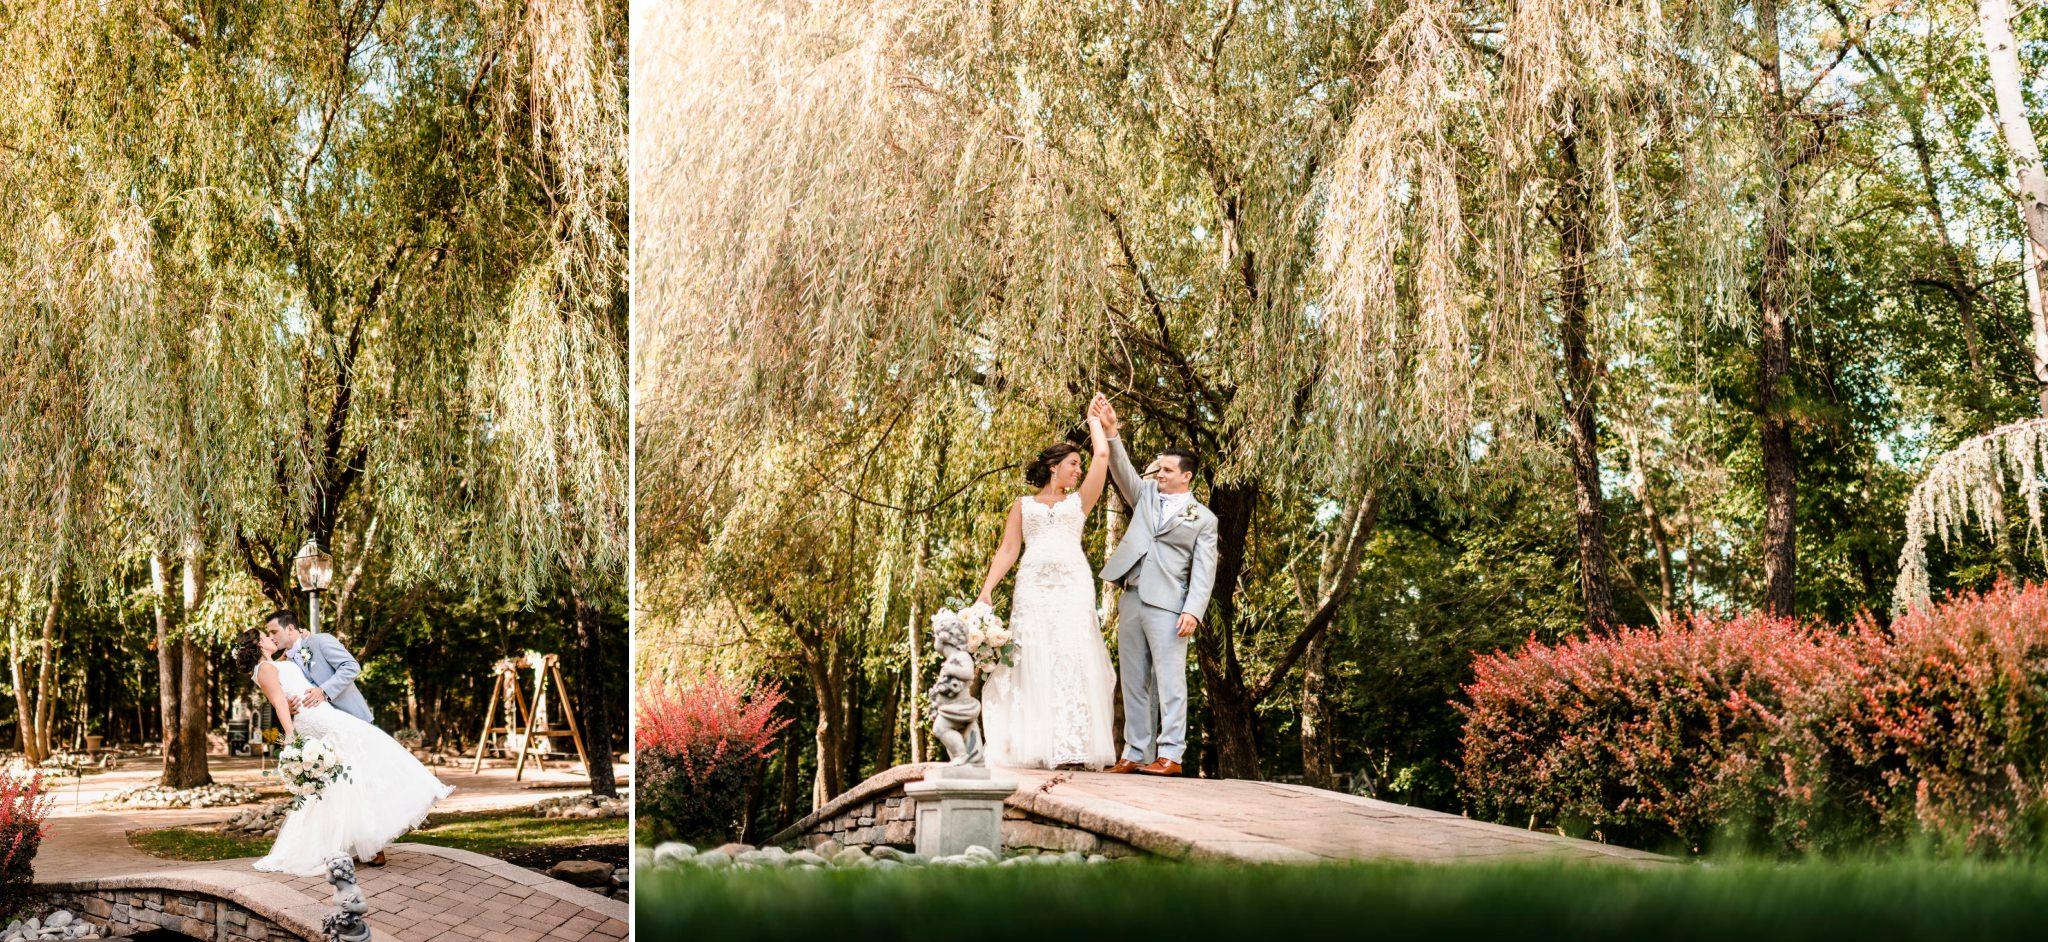 Gilbert-Brigalias-NJ-Wedding-Photographer-51.JPG